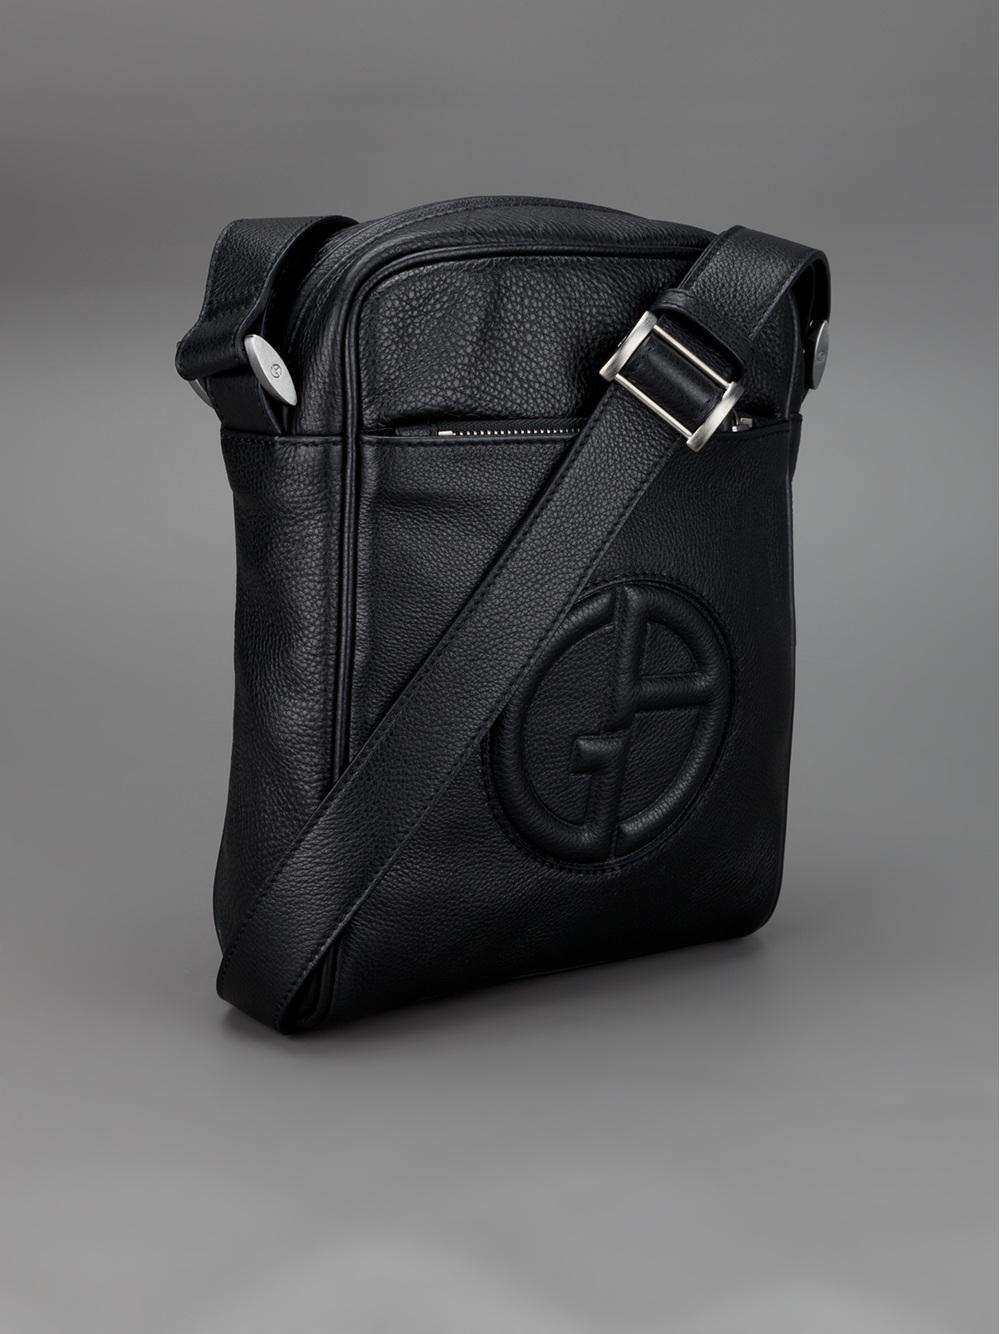 892dd29dce01 Lyst - Giorgio Armani Raised Logo Messenger Bag in Black for Men